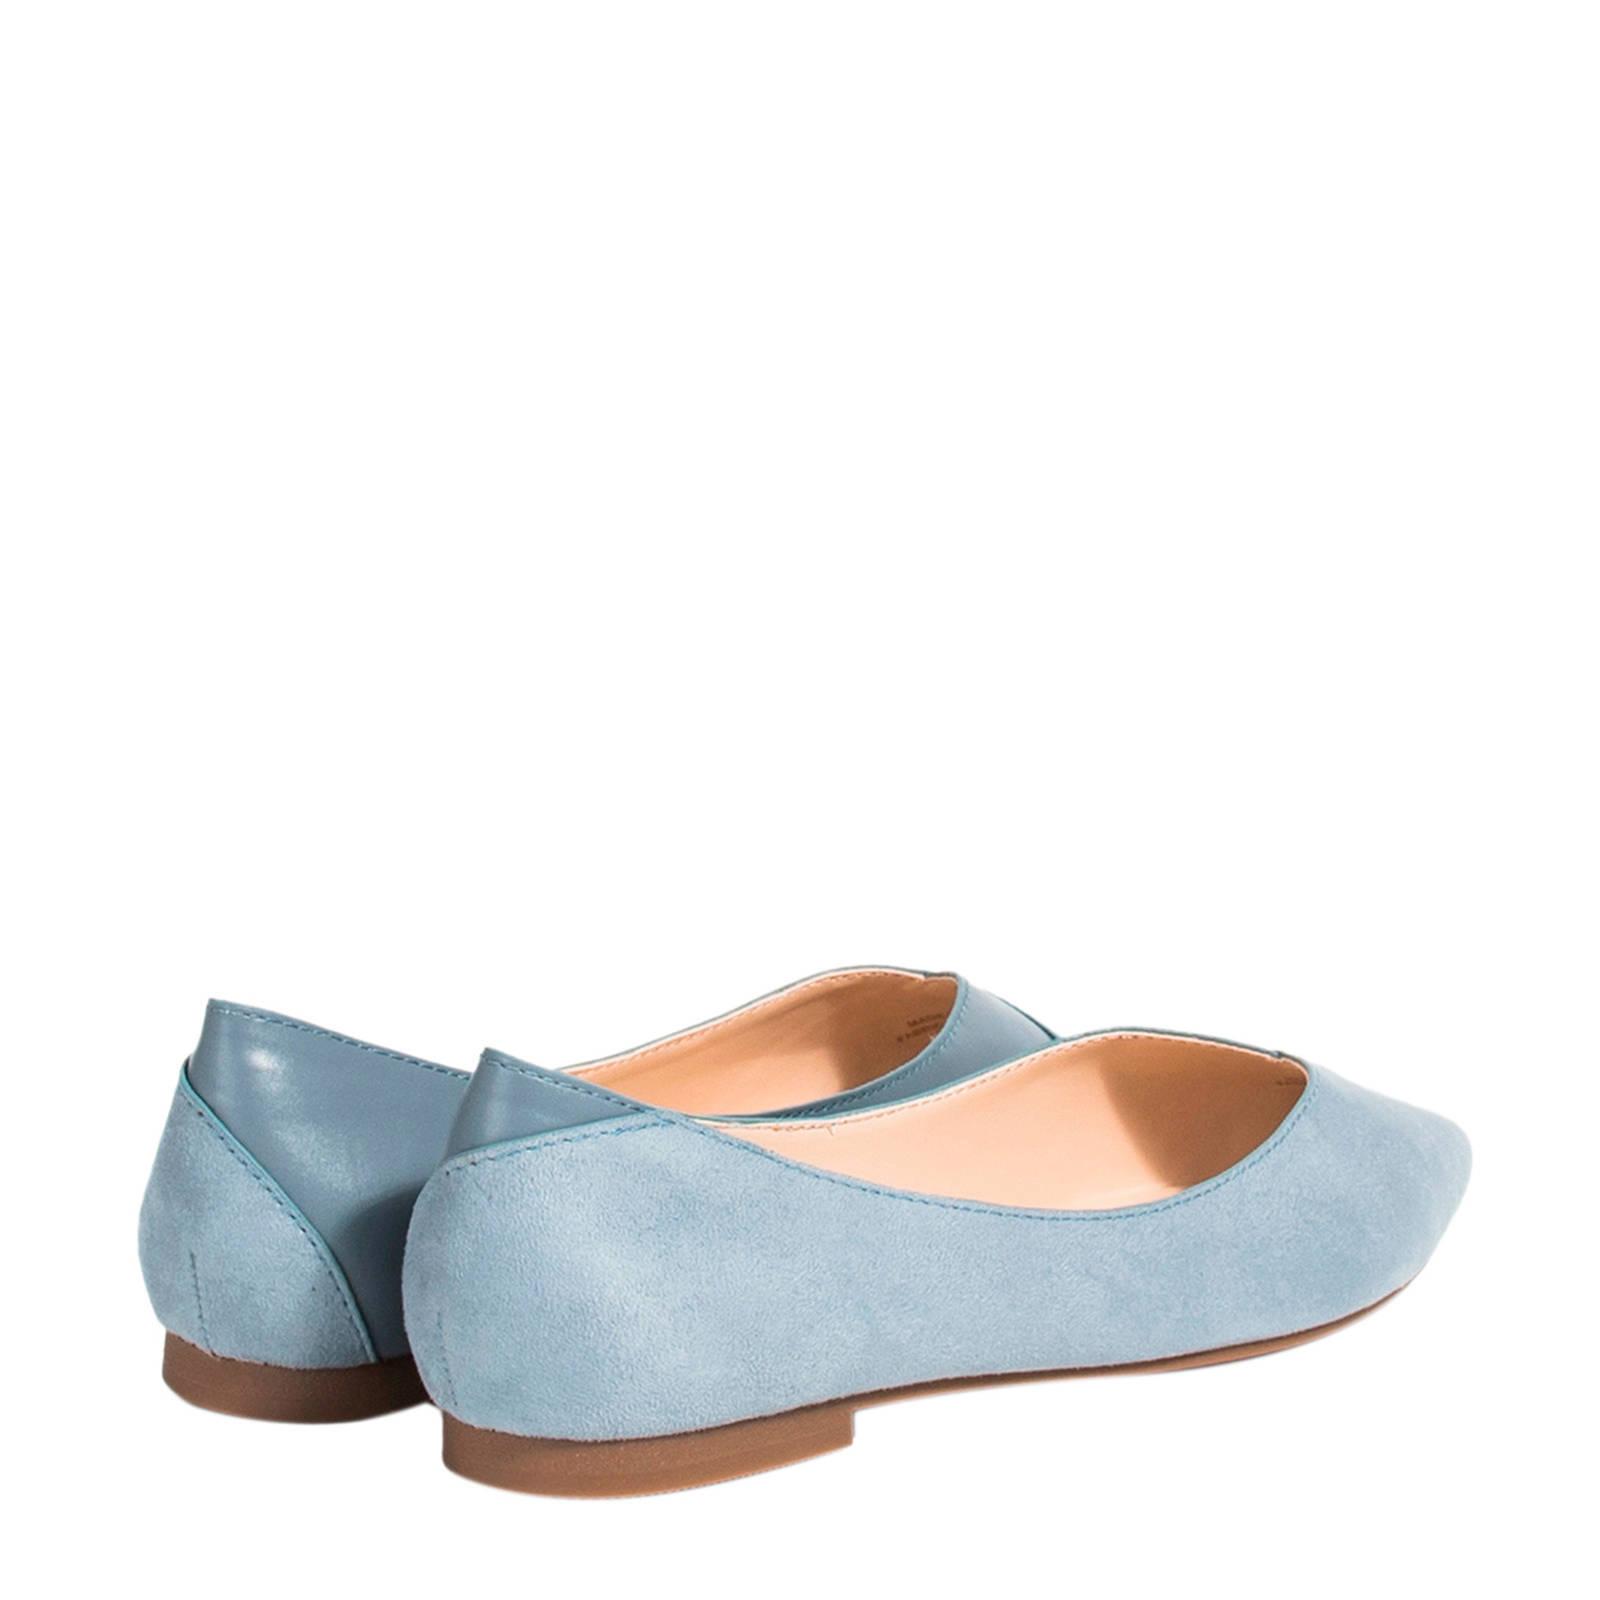 Parfois Chaussures Bleu Clair G7eT45ky6v